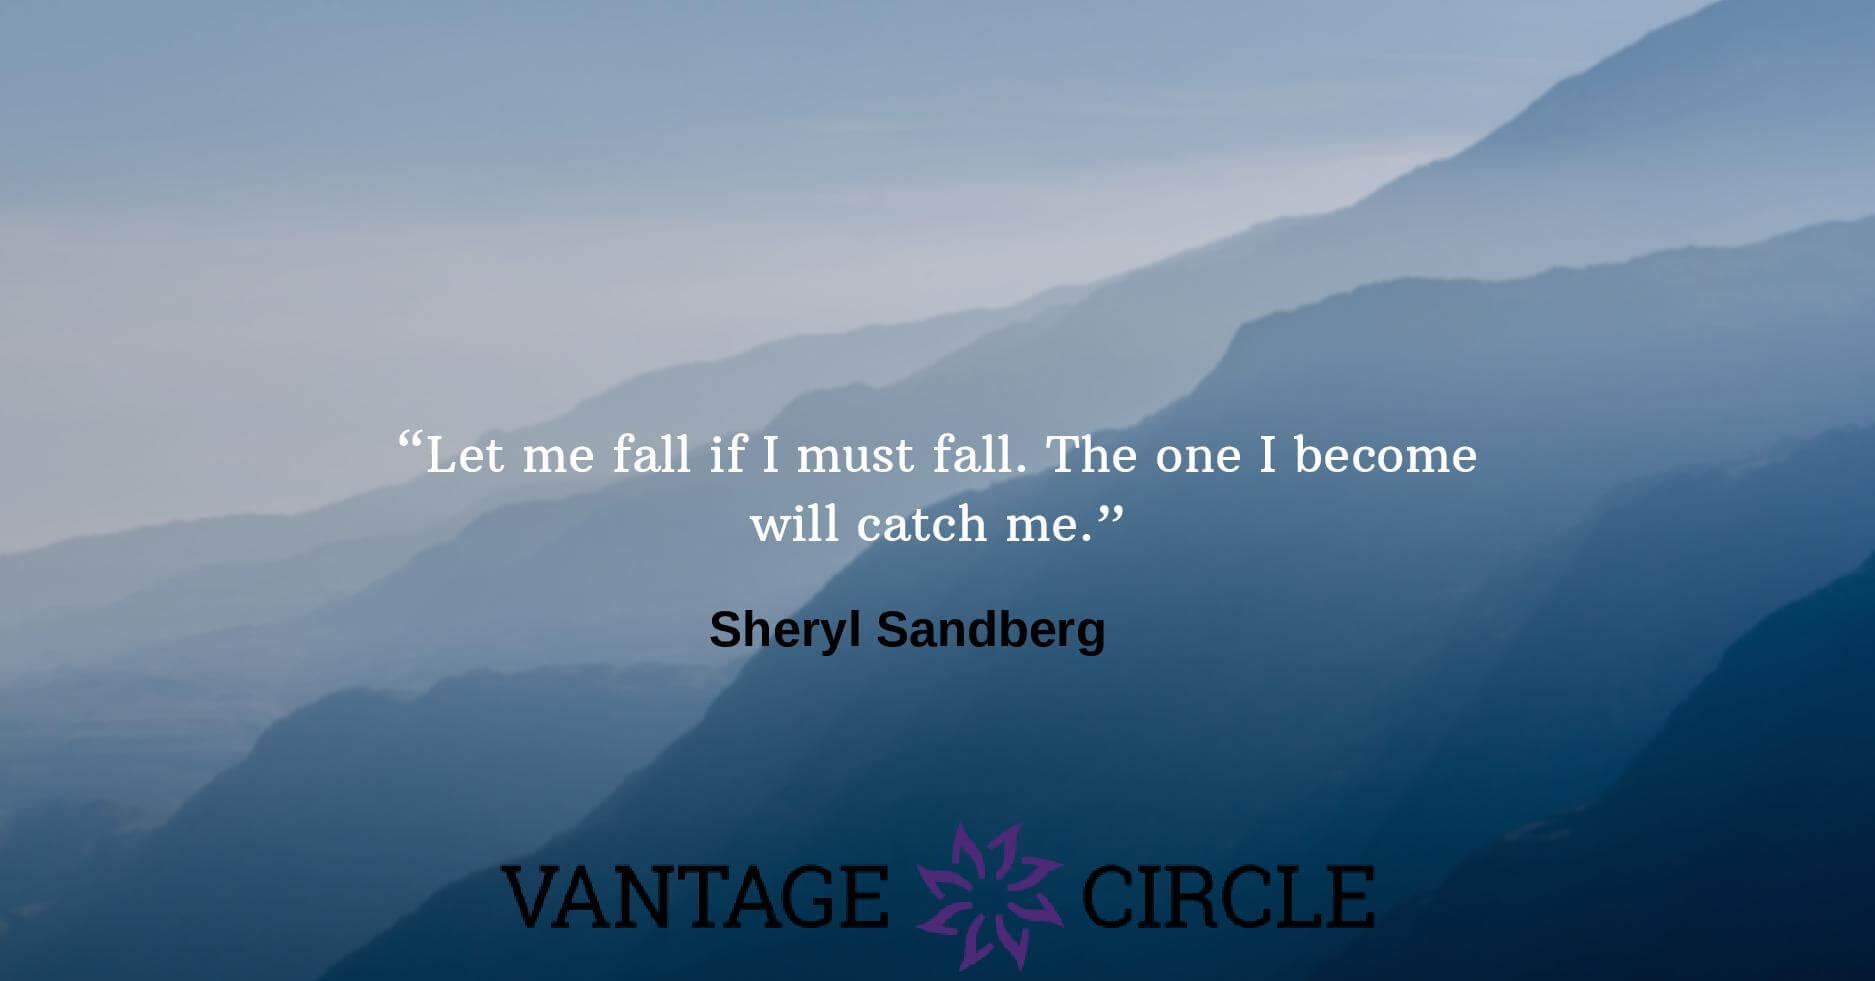 Employee-motivational-quotes-Sheryl-Sandberg